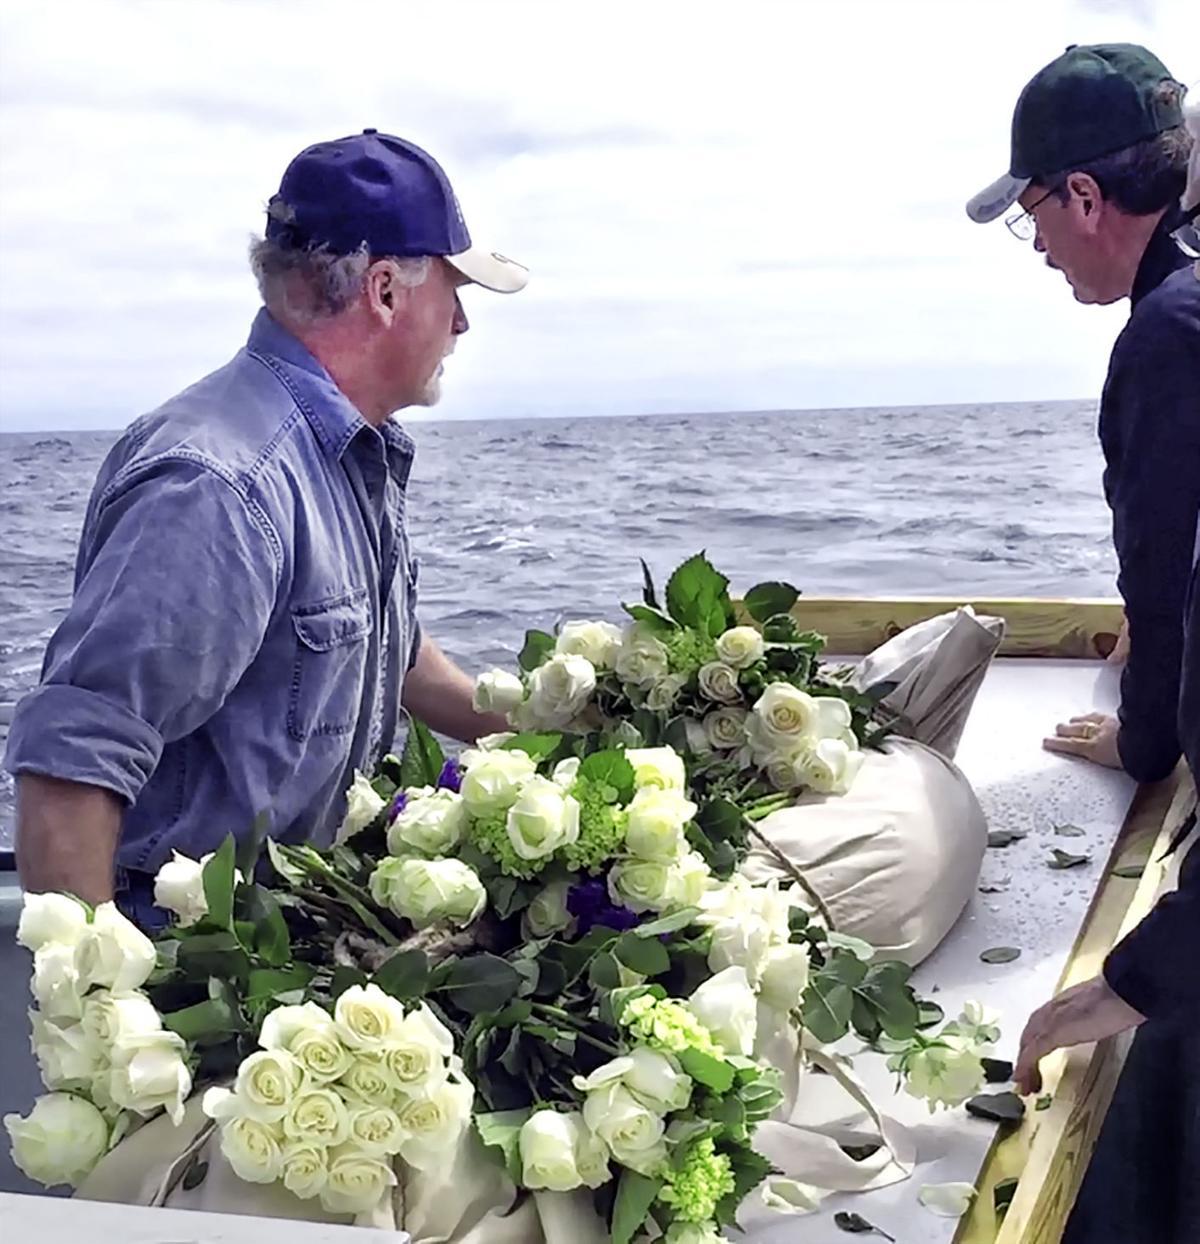 082015-lng-nws-burial-1.jpg